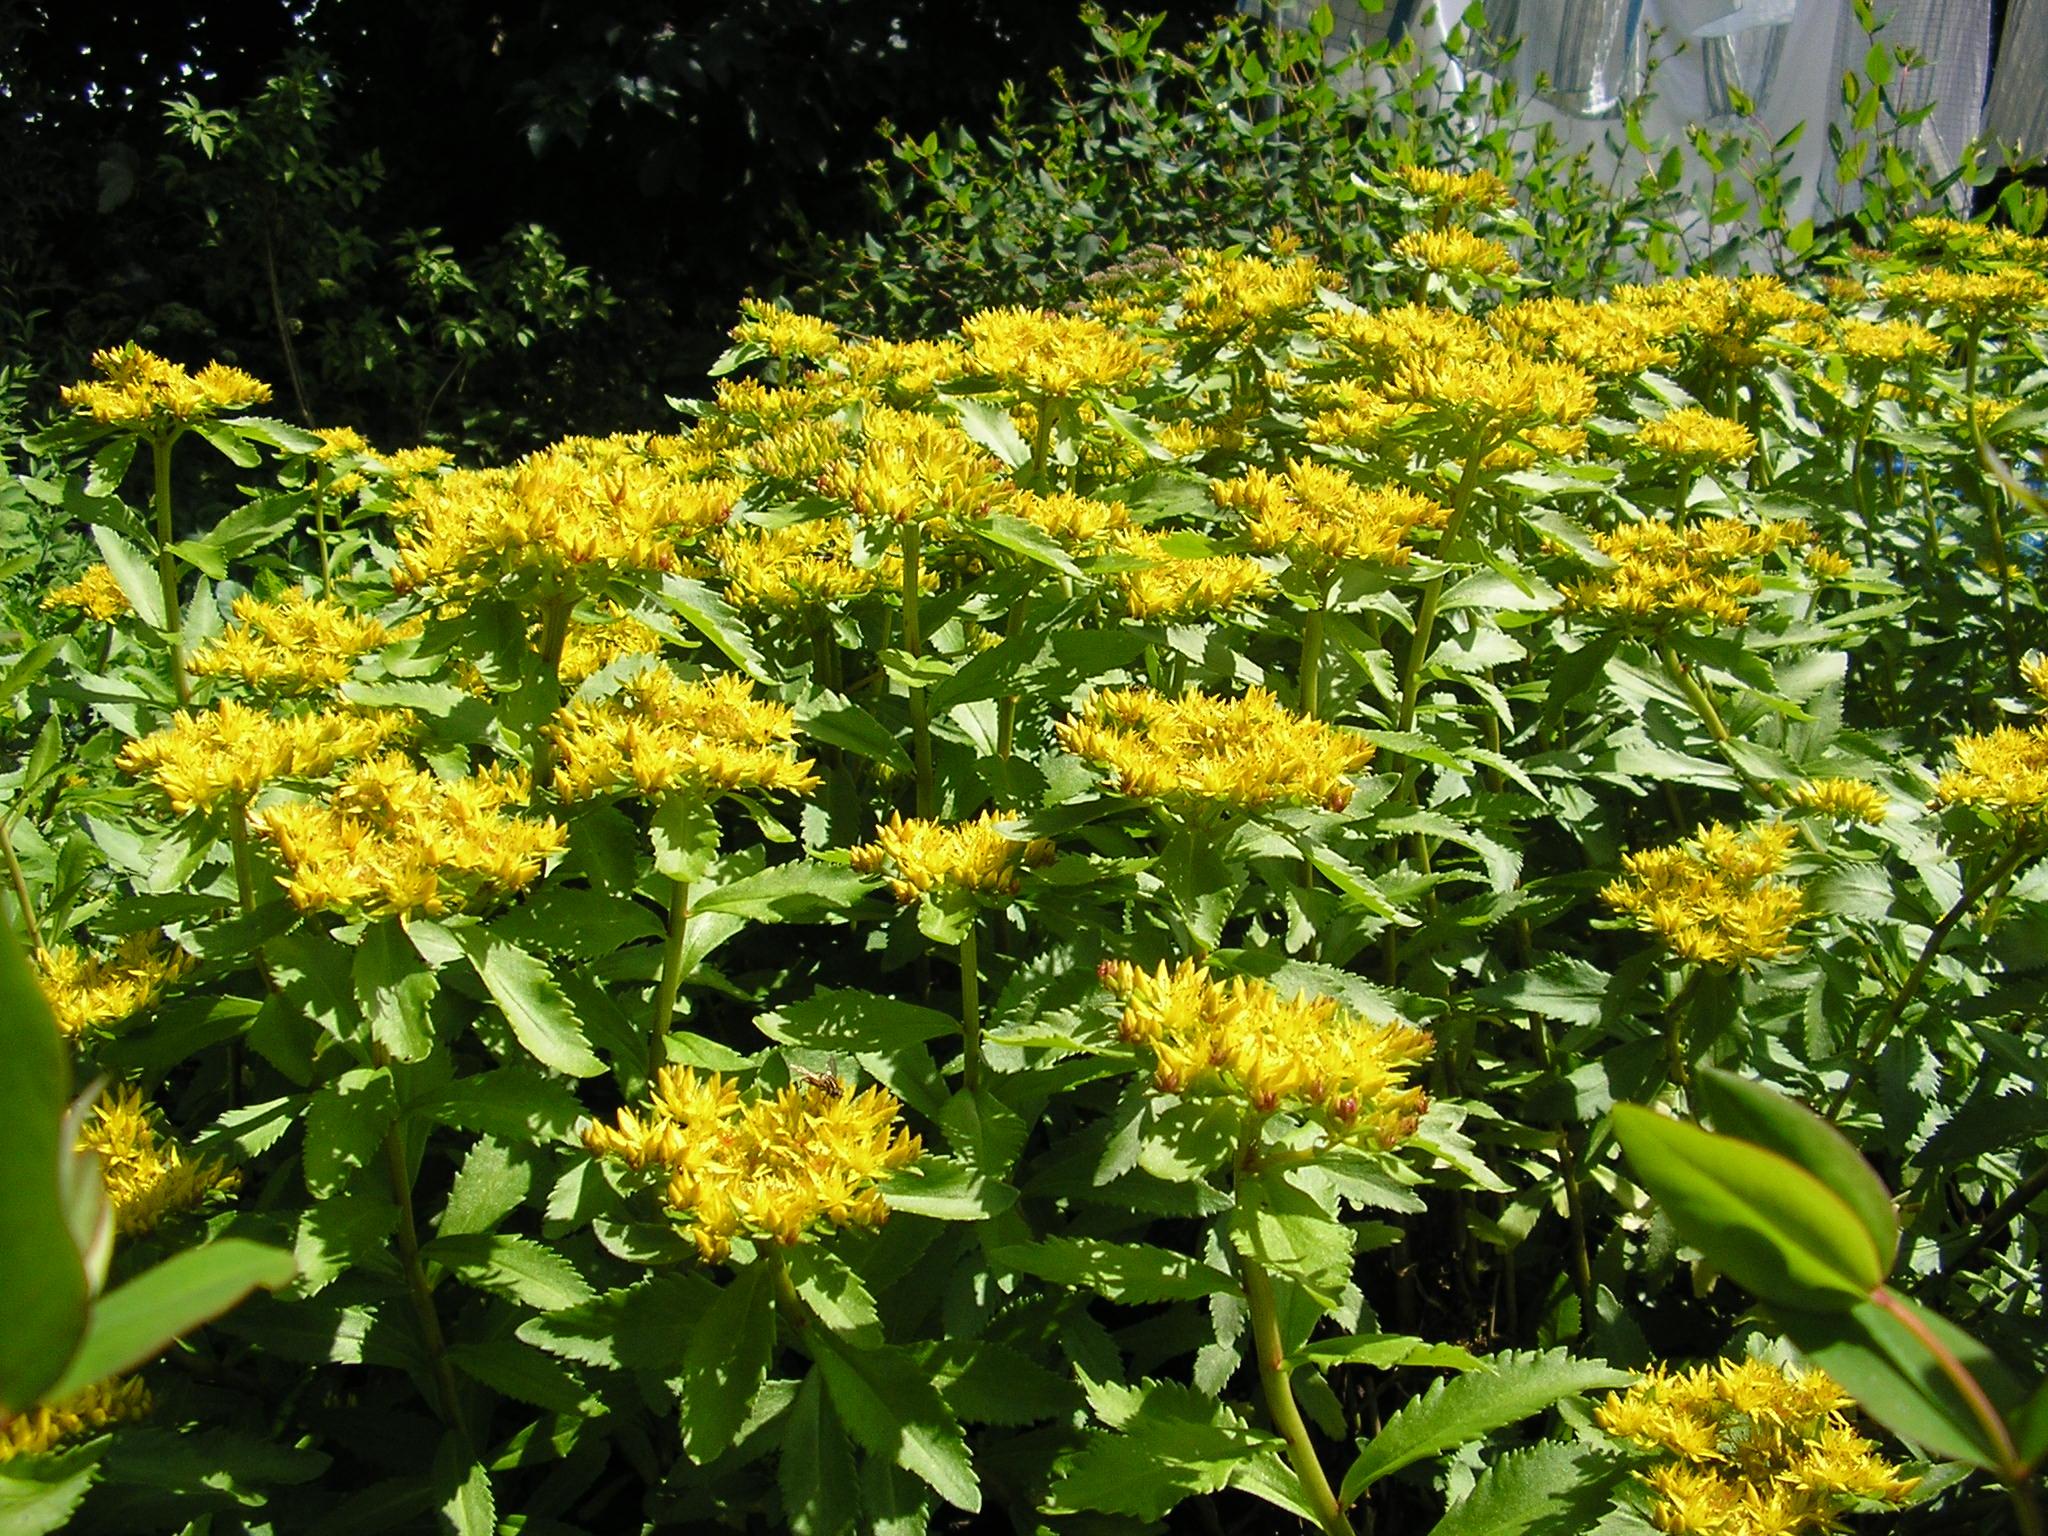 staude gul blomst